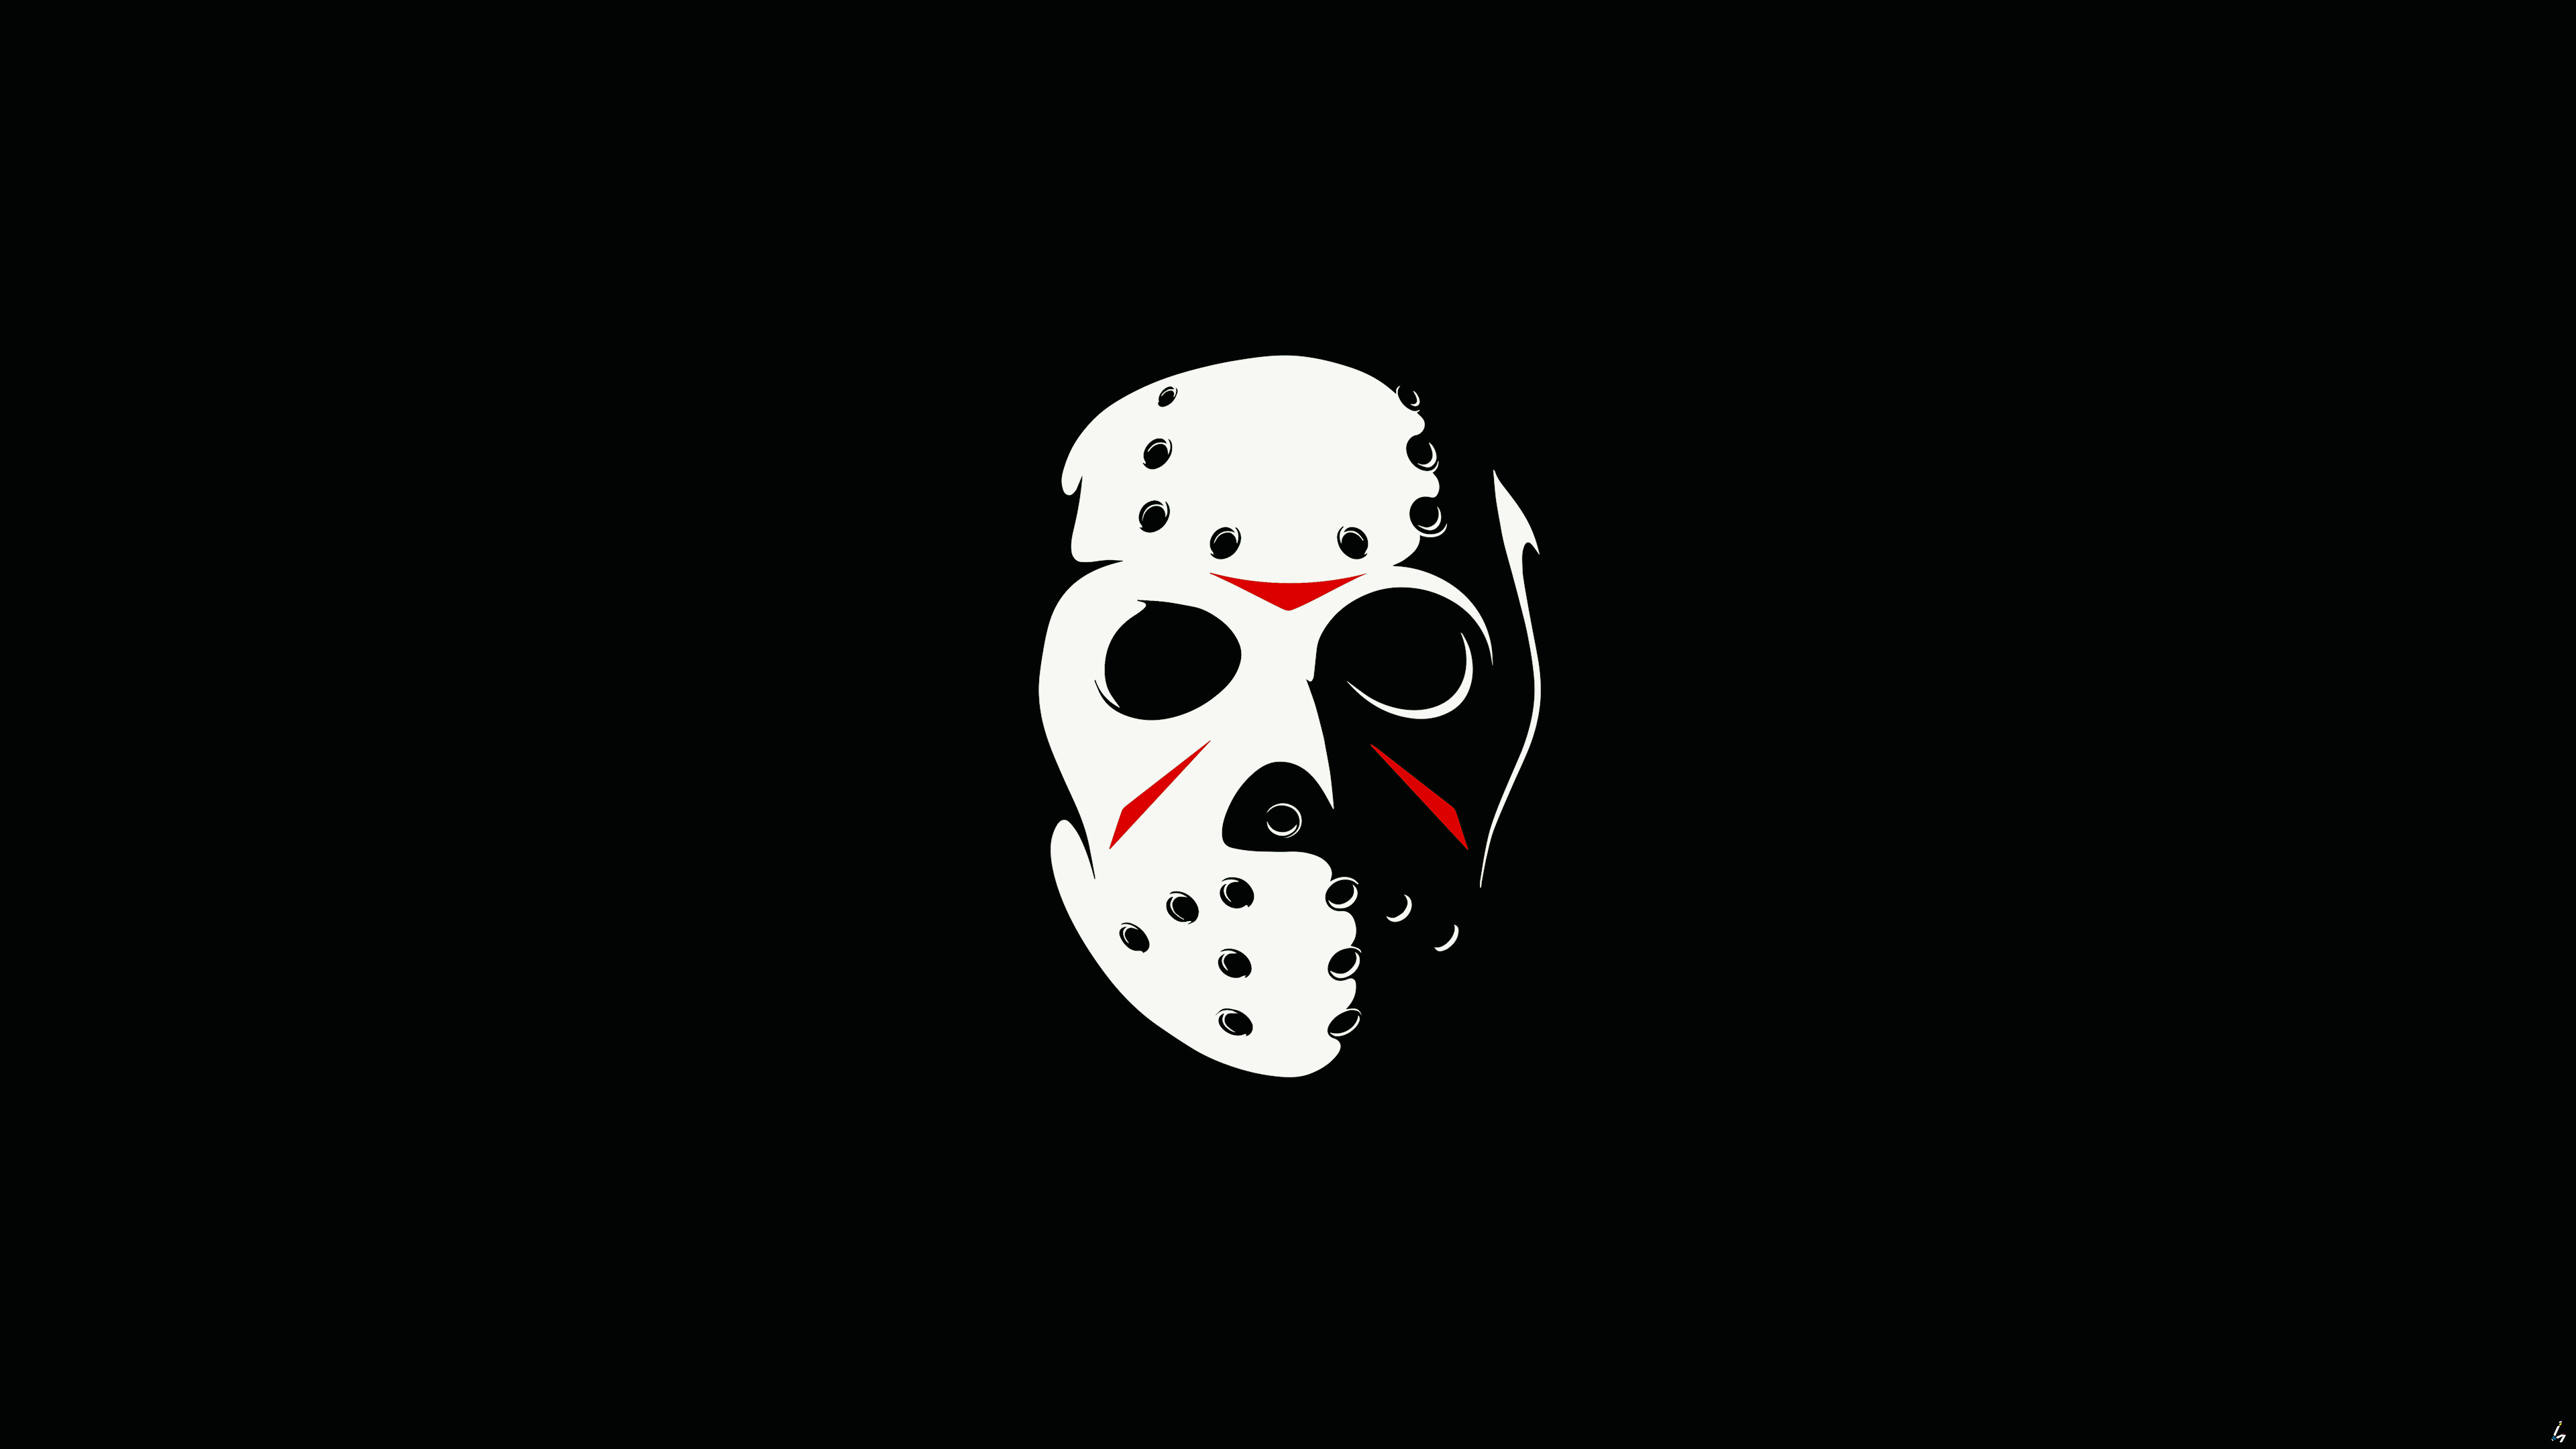 Friday the 13th the game minimalism dark 4k hd games 4k - Friday the thirteenth wallpaper ...